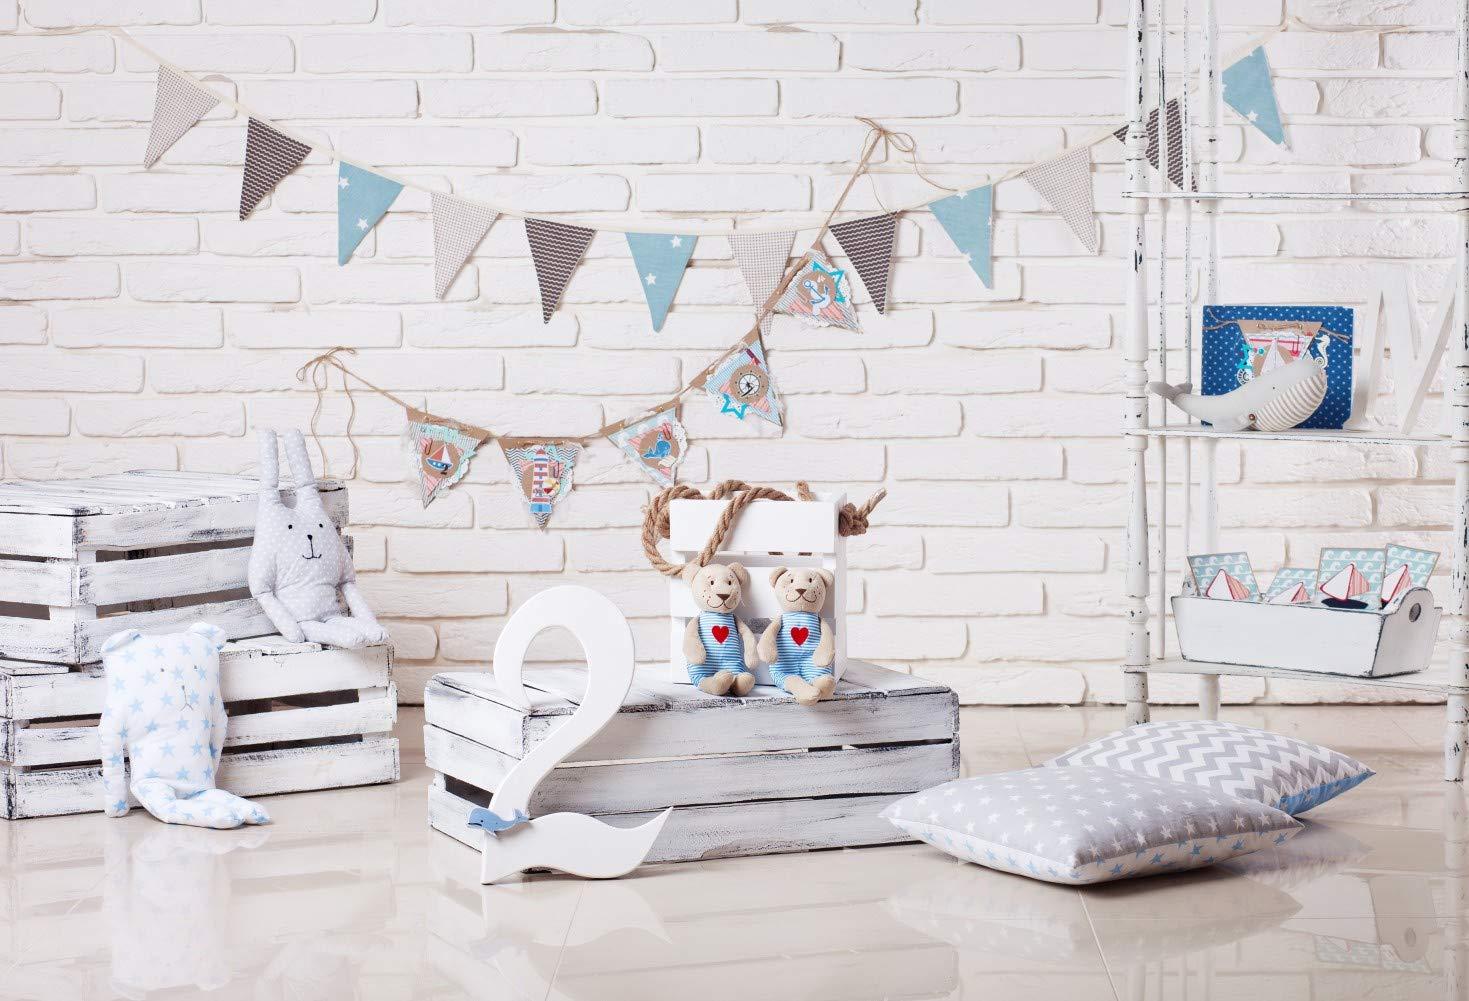 7x5フィート 赤ちゃん 2歳 誕生日 海 旅行 スタイル テーマ レンガ グレー 旗 壁 木製棚 絵 布 カスタマイズ 写真 背景 デジタルプリント 背景 写真 スタジオ 小道具   B07PQBL497